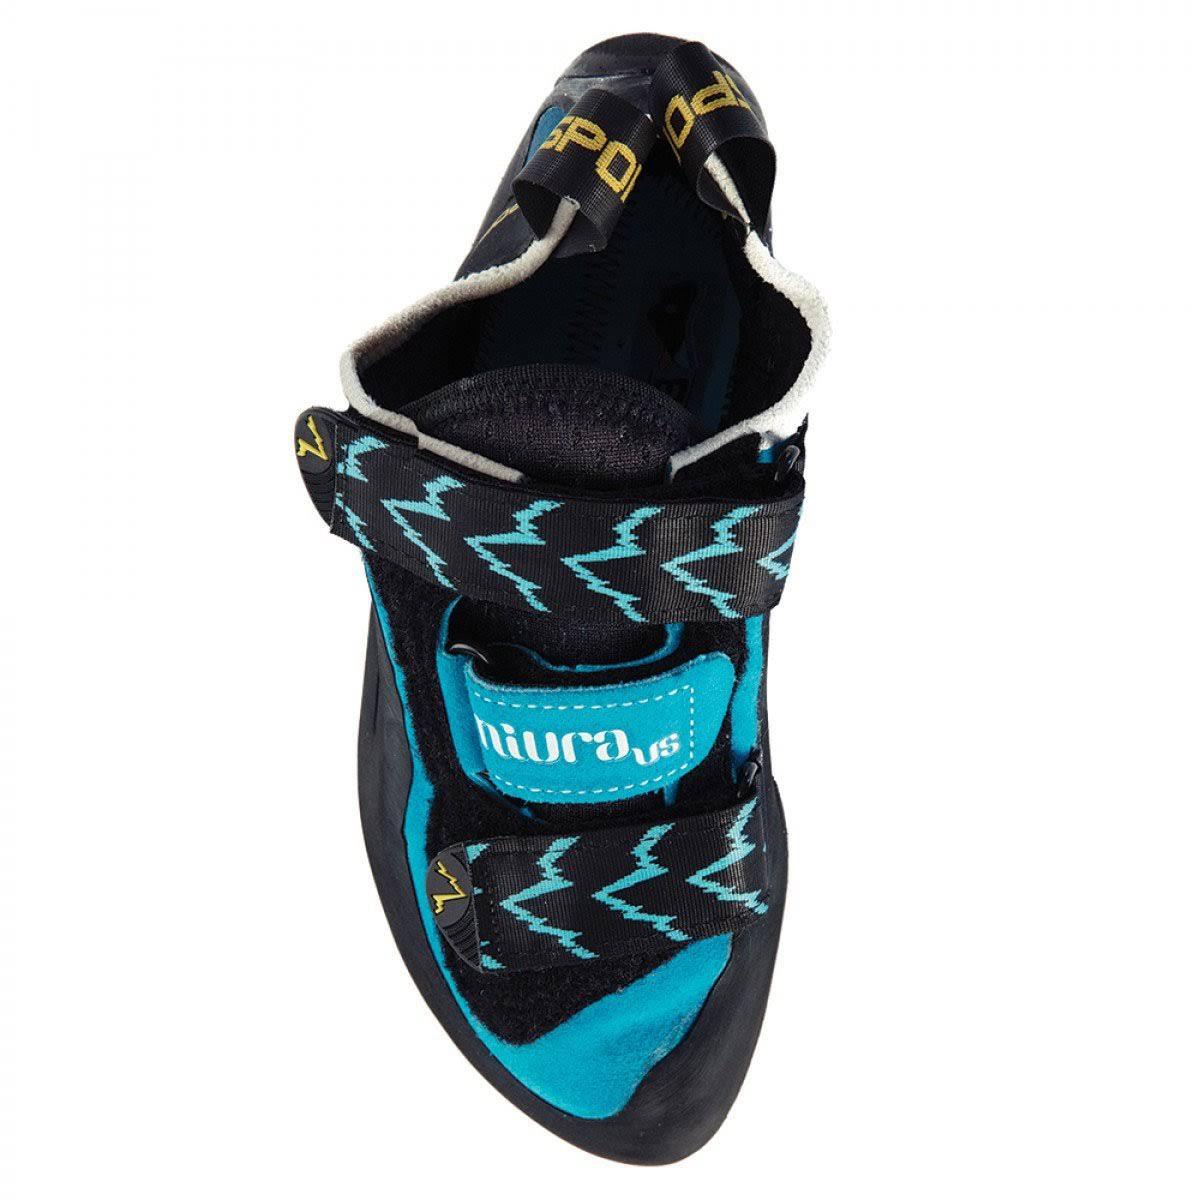 Xs Sportiva blauw La Vibram Vs 5 Grip2 Miura klimschoenDamesblauw32 If6vbgY7y